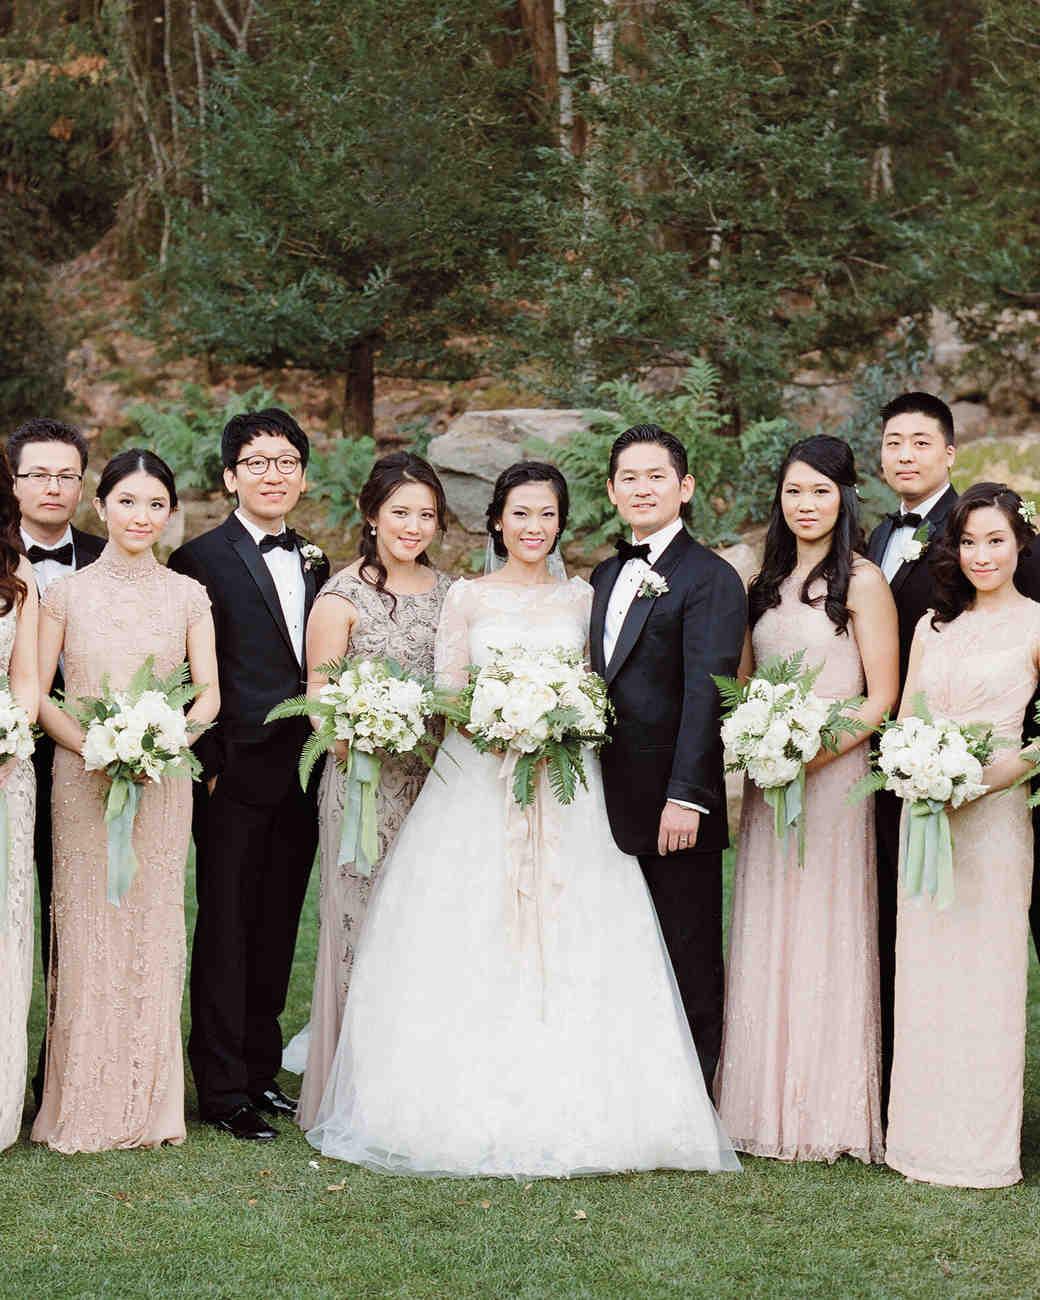 adriana-han-wedding-57340006-s111814.jpg